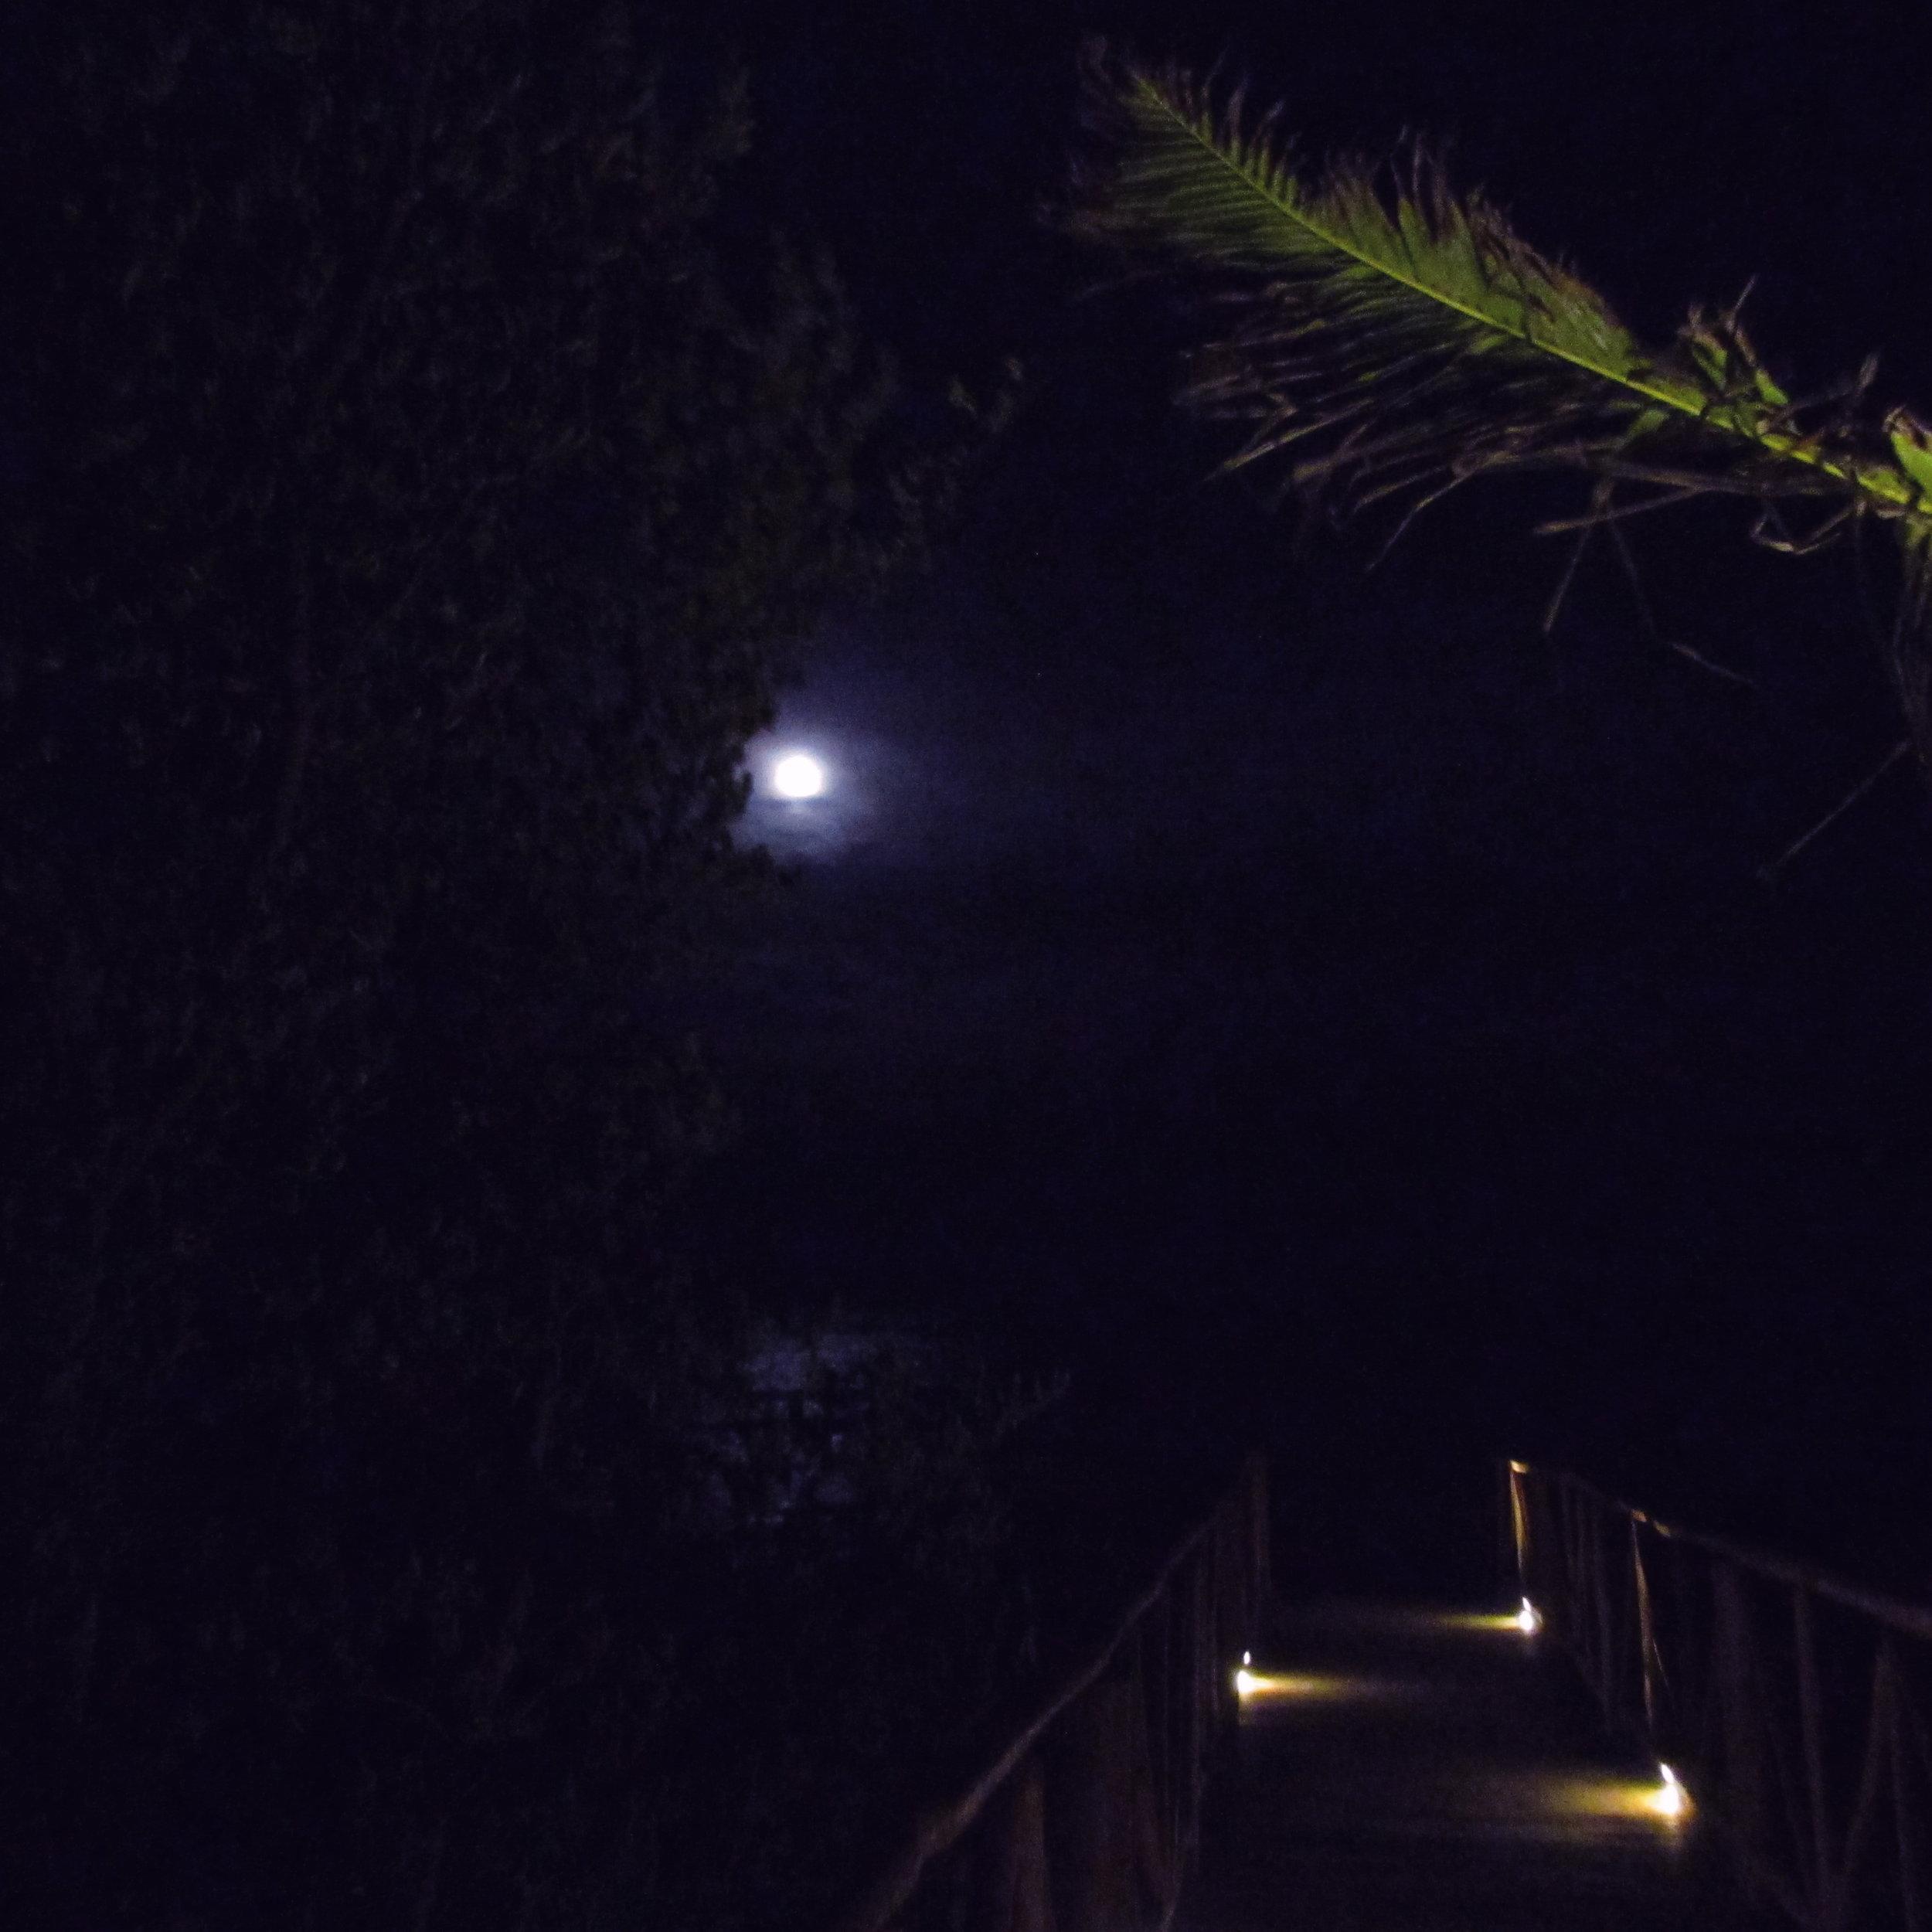 Palm TreeNight.JPG